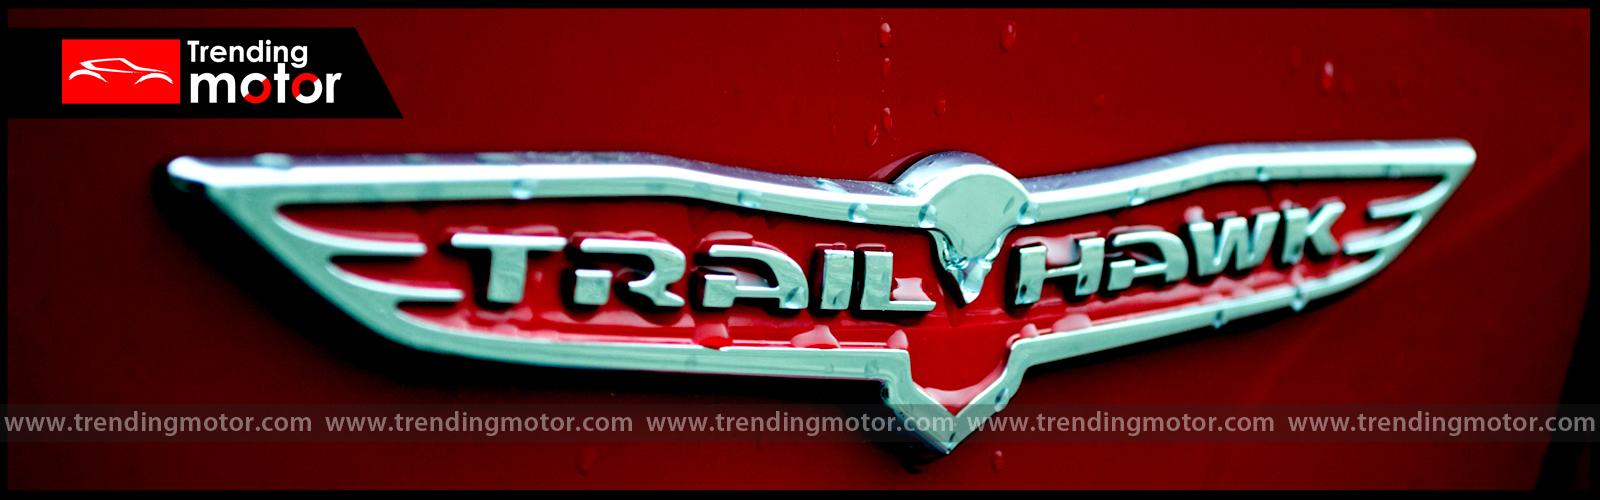 Jeep-compass-trailhawk-logo-2018-trendingmotor